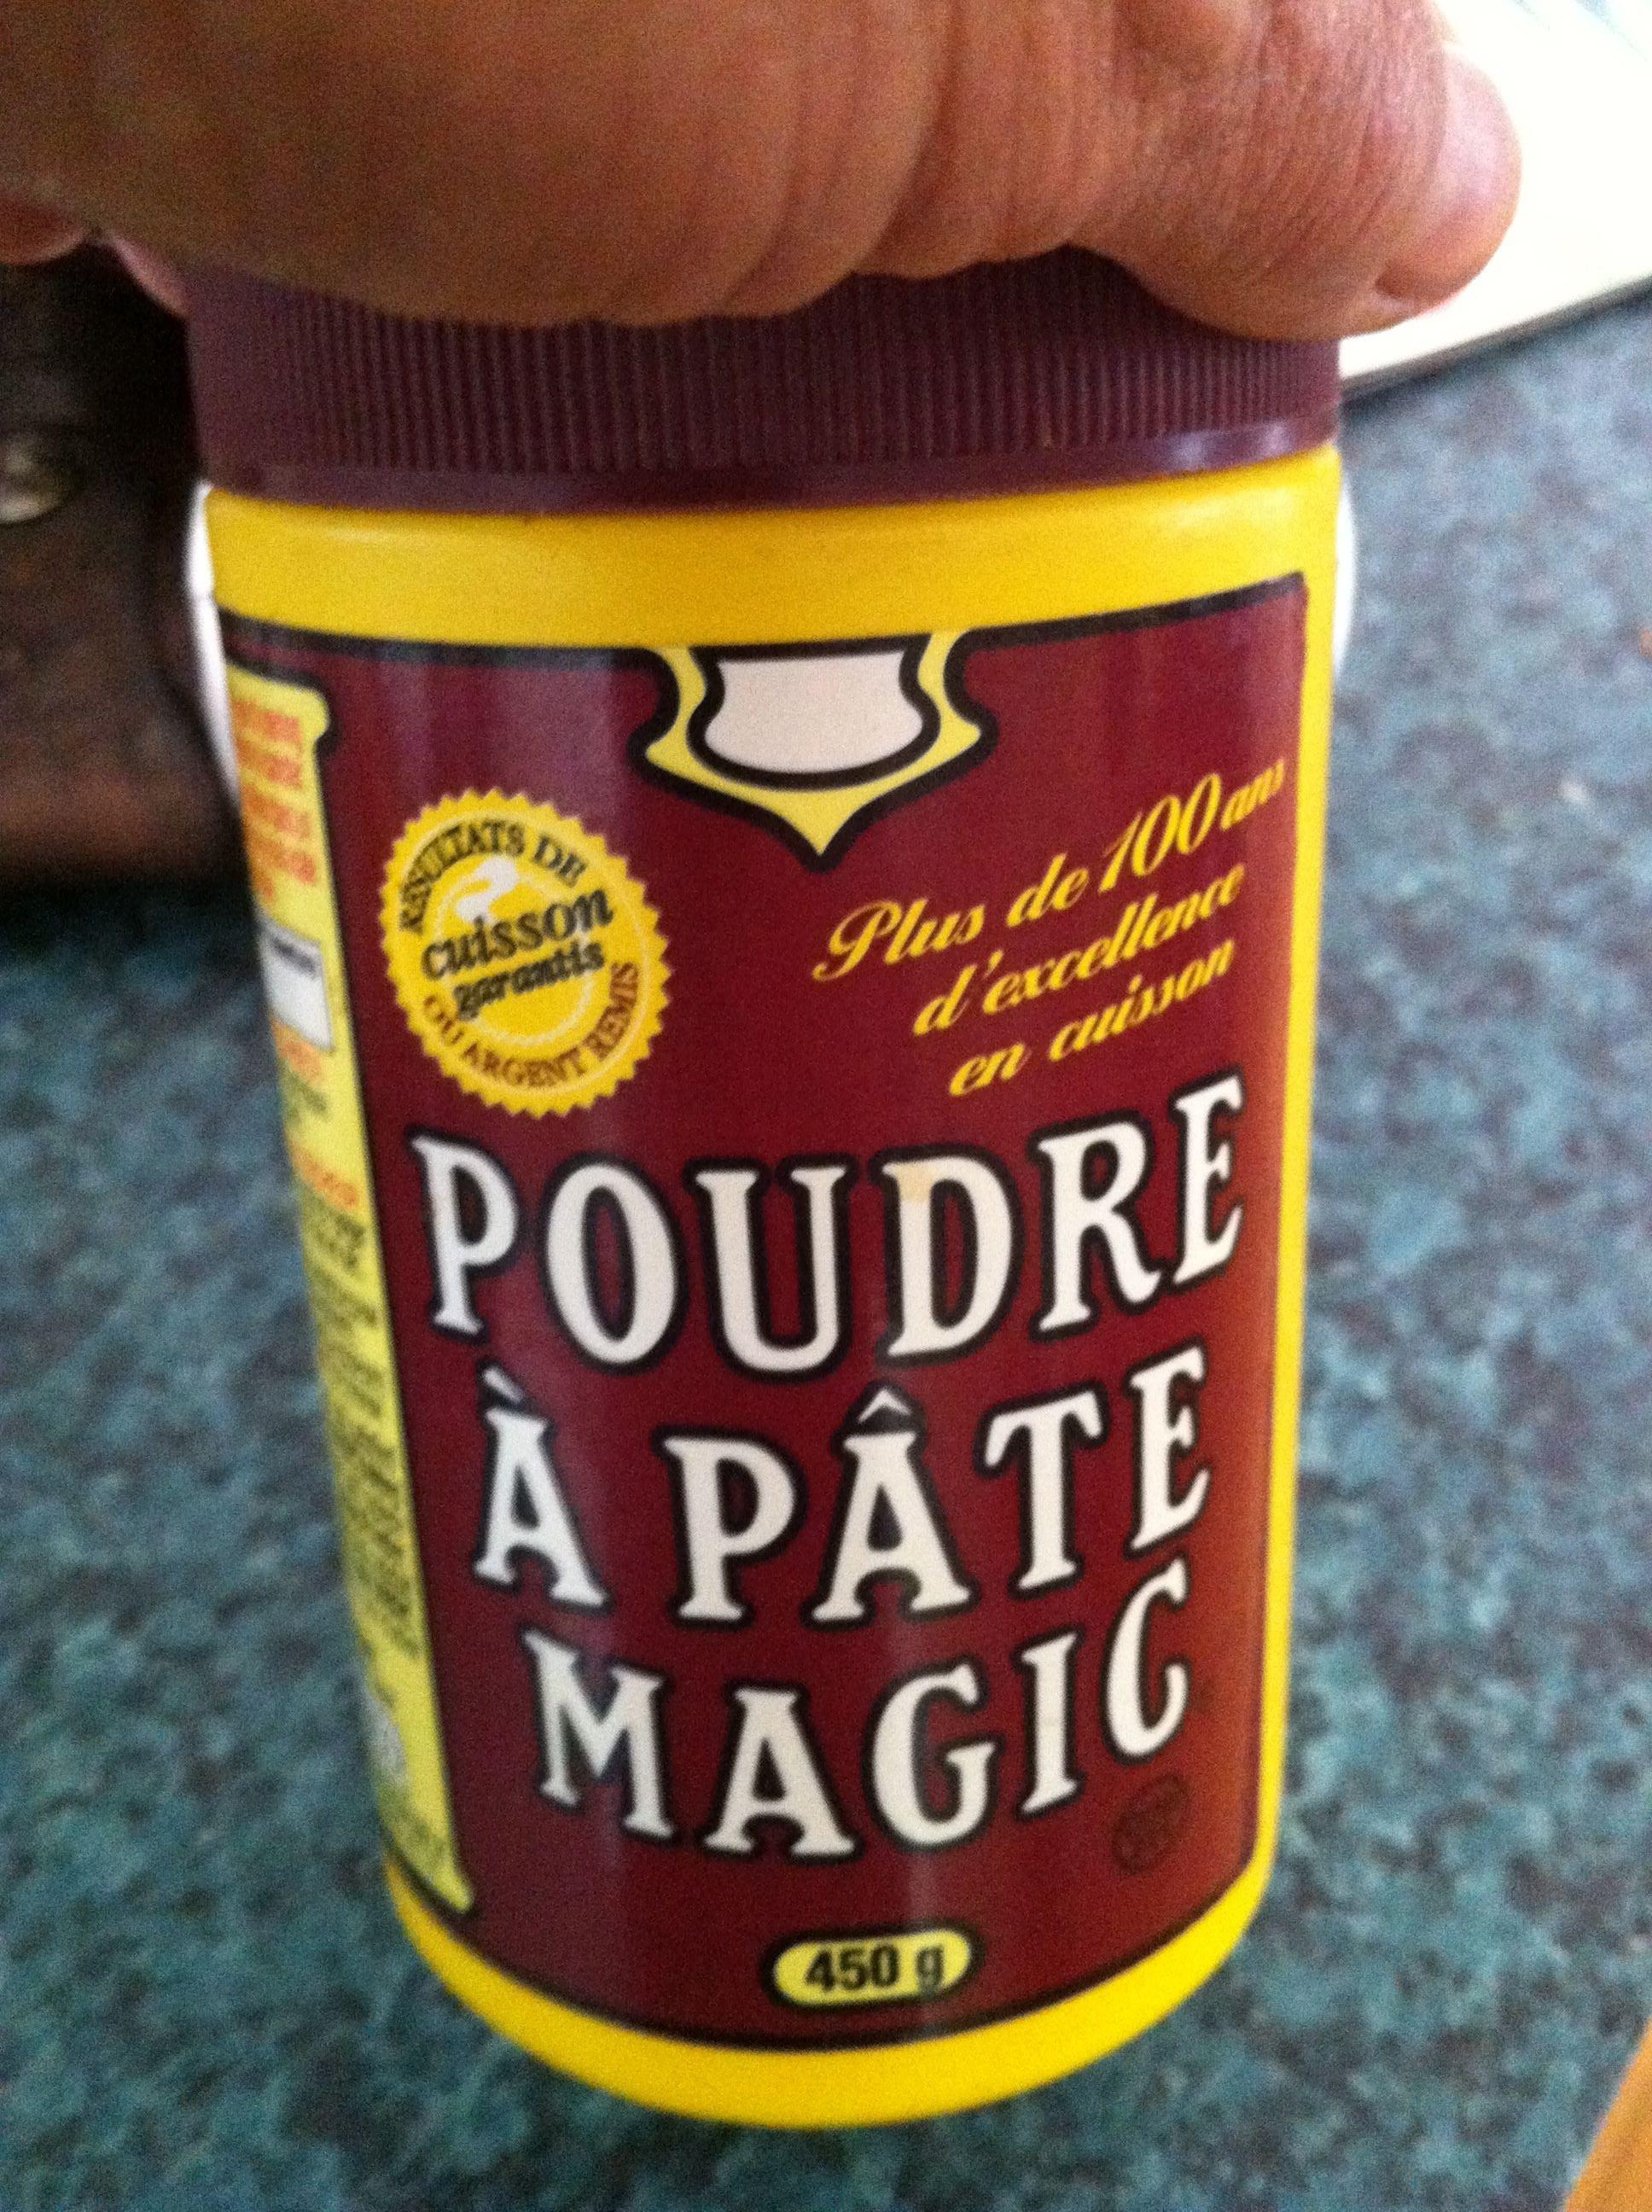 Magic Baking Powder - Prodotto